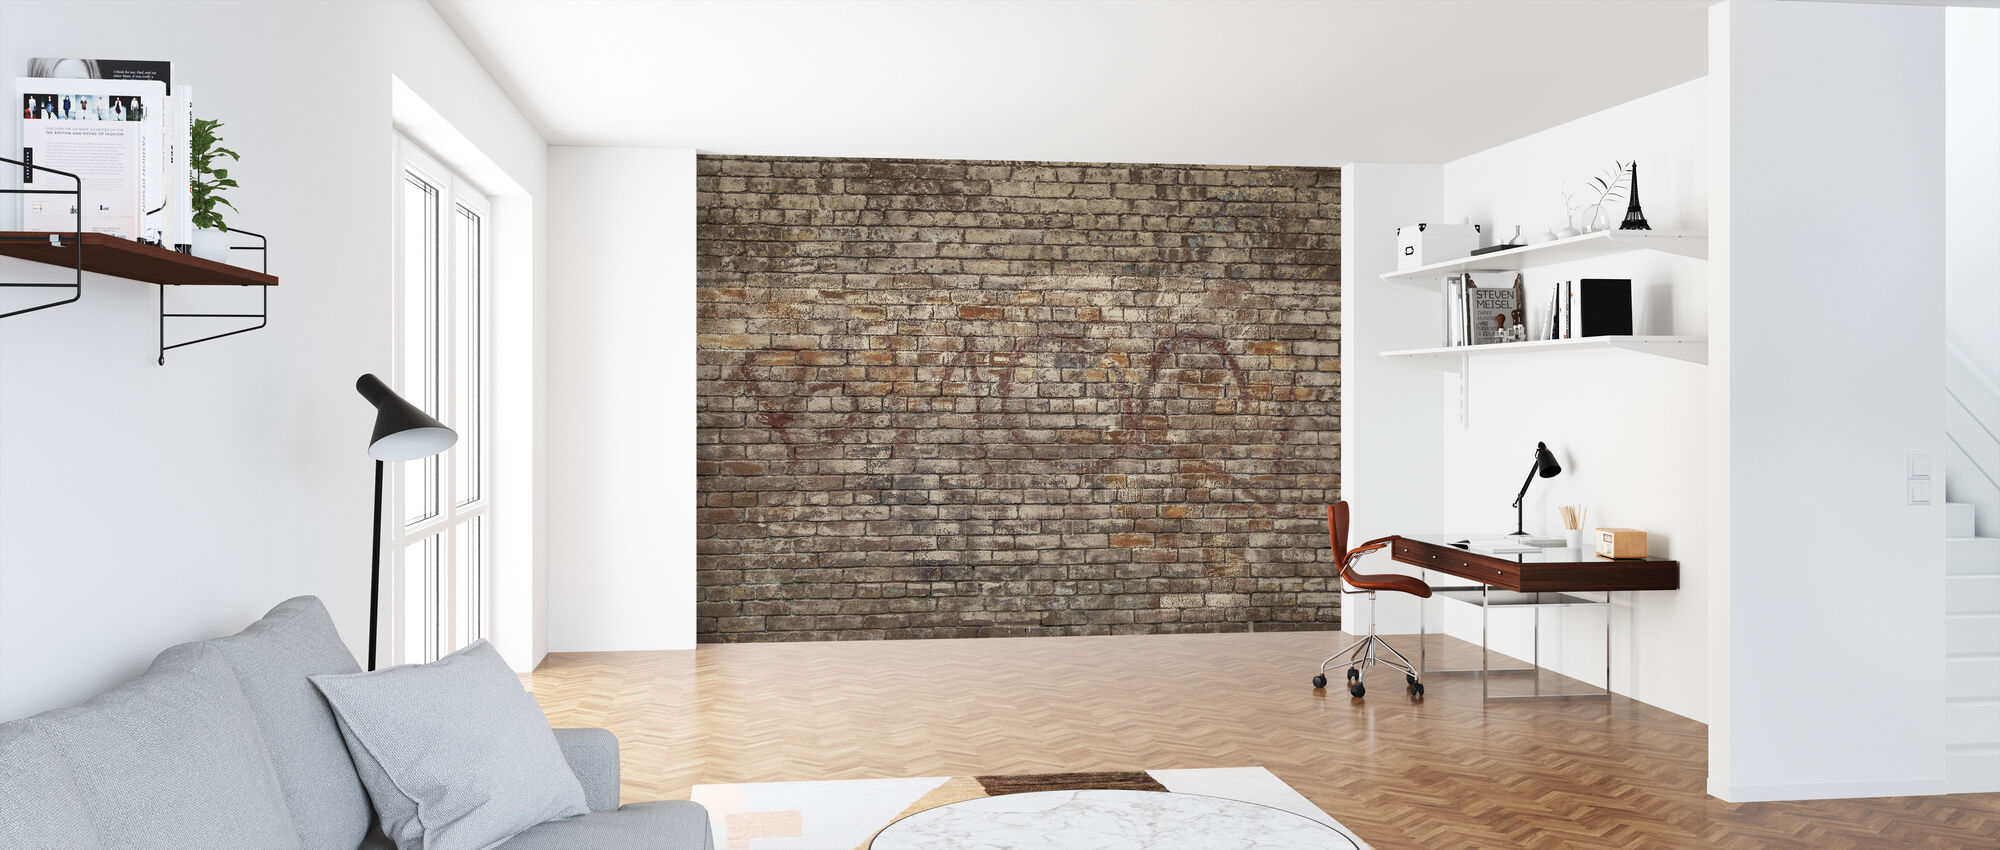 Mursten Wall Graffiti - Tapet - Kontor